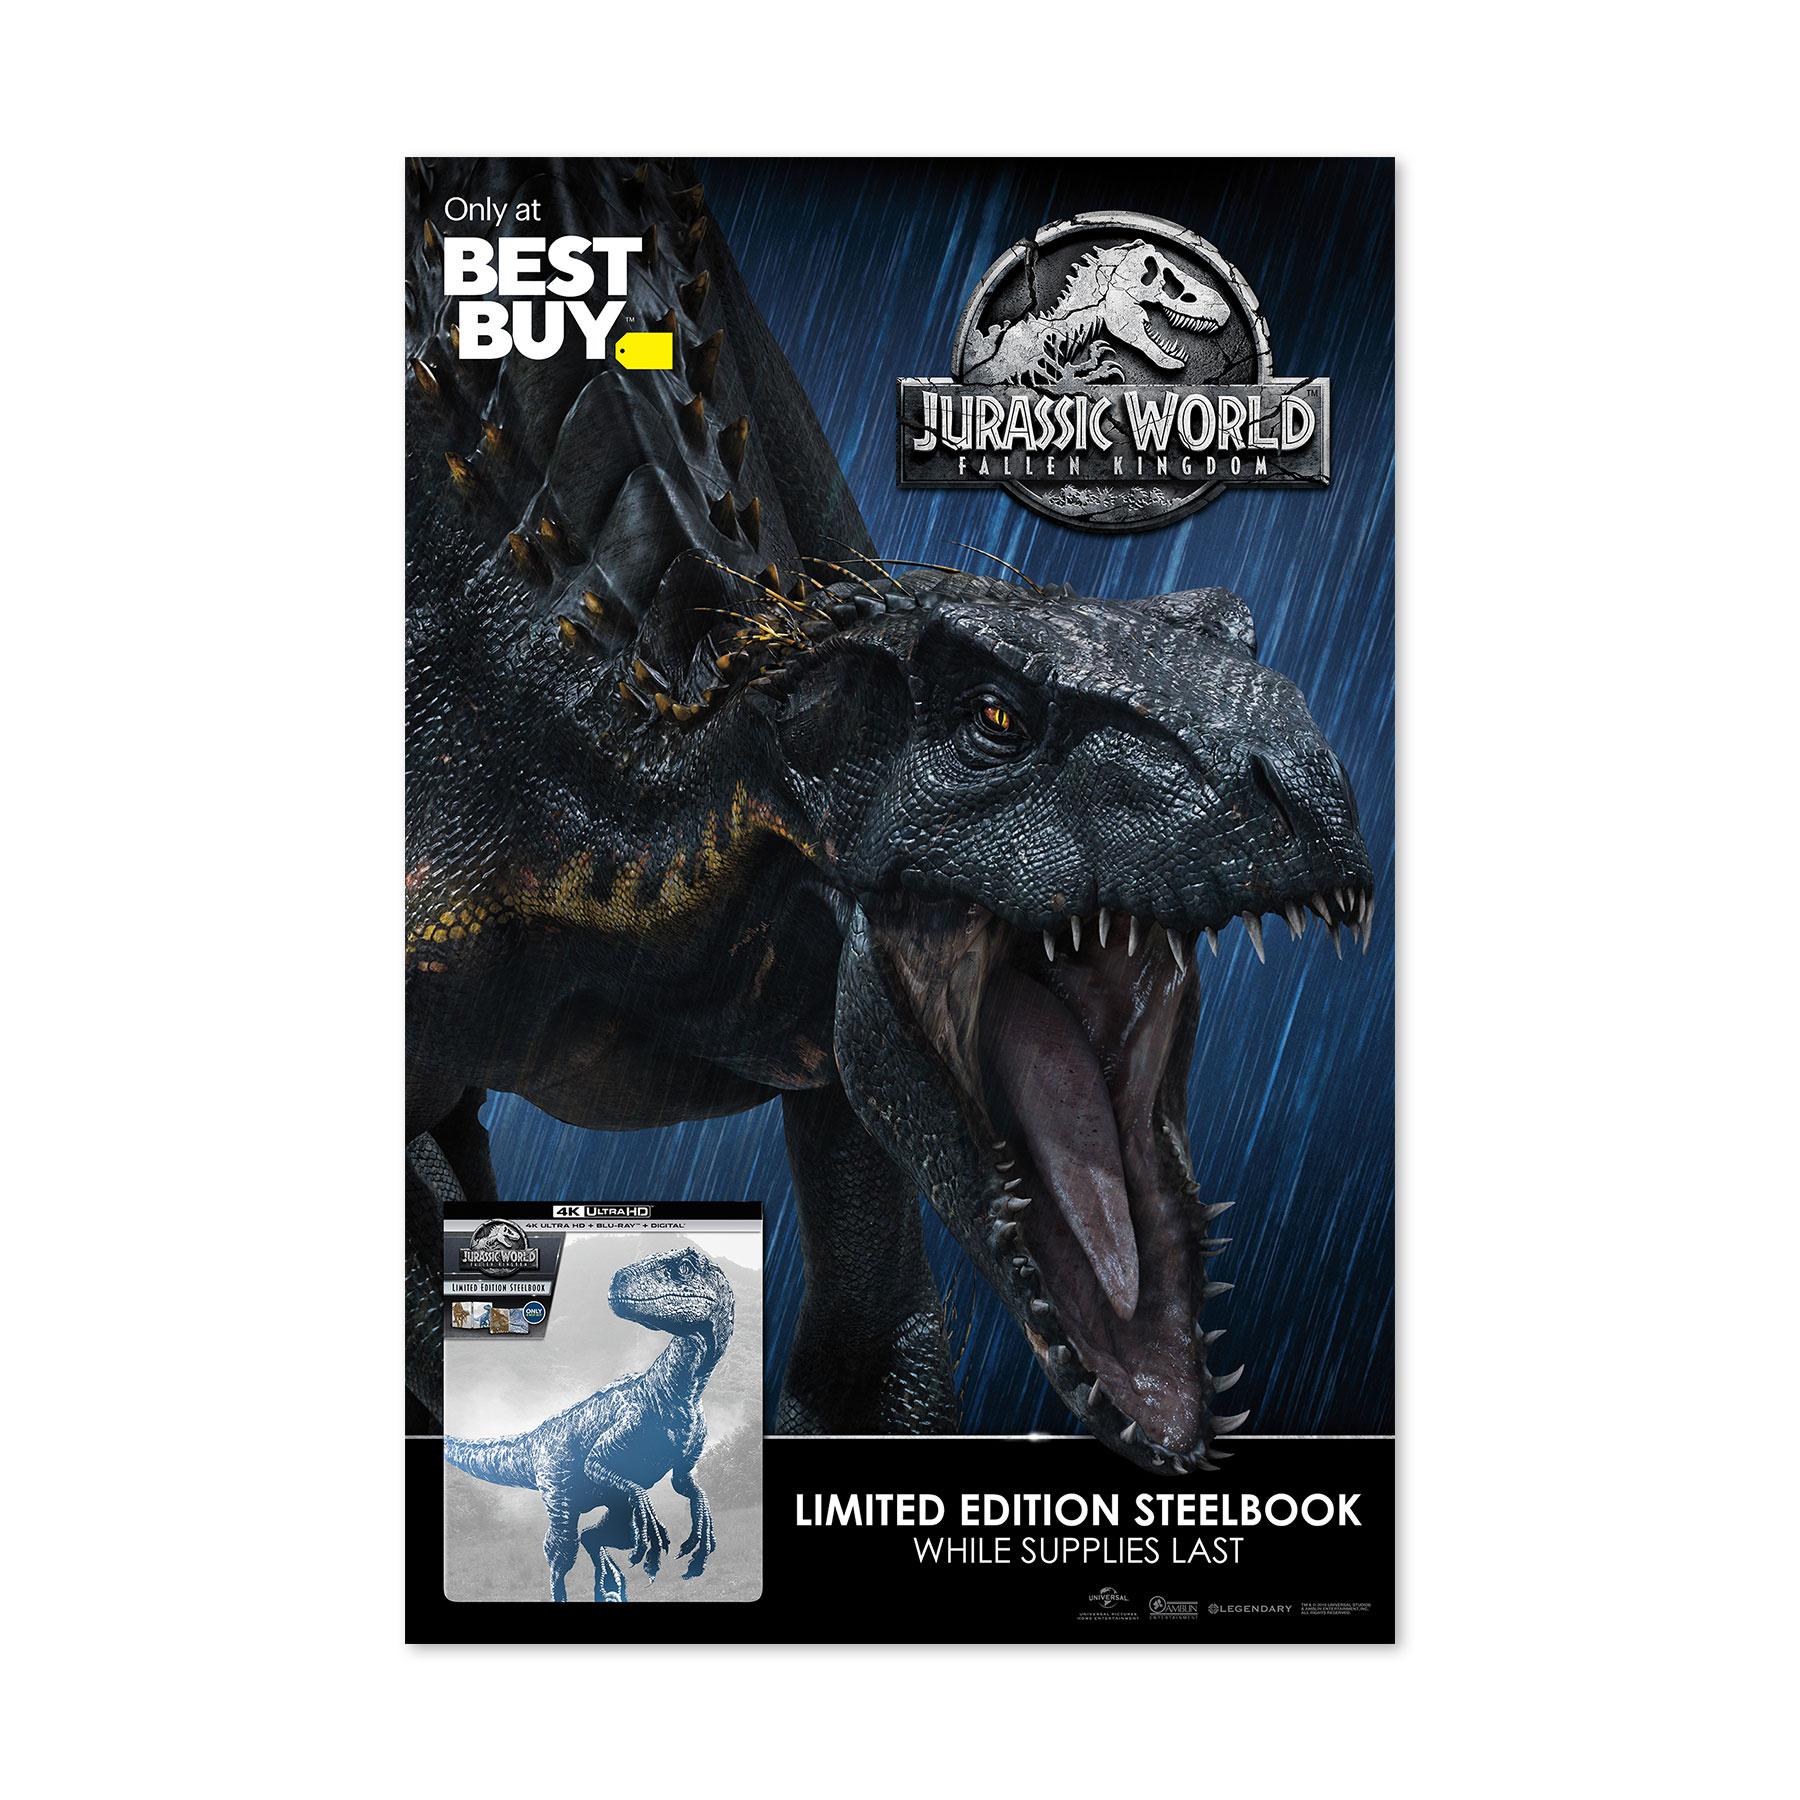 Jurassic World: The Fallen Kingdom Best Buy Sidewalk Sign